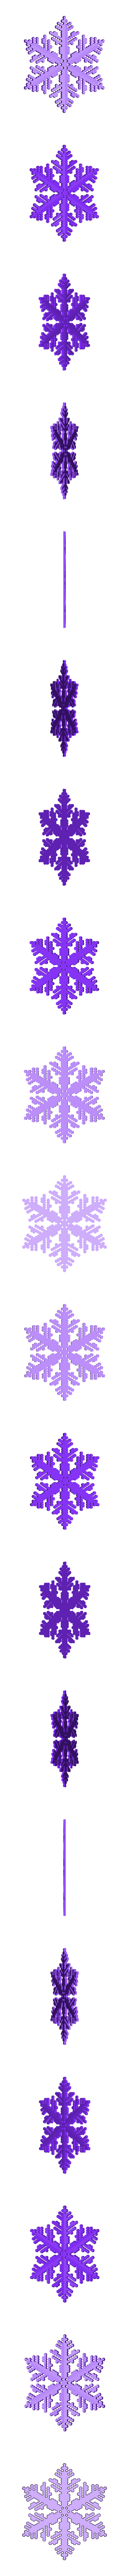 reiter30rand-gamma.stl Download free STL file Snowflake growth simulation in BlocksCAD • 3D printing design, arpruss